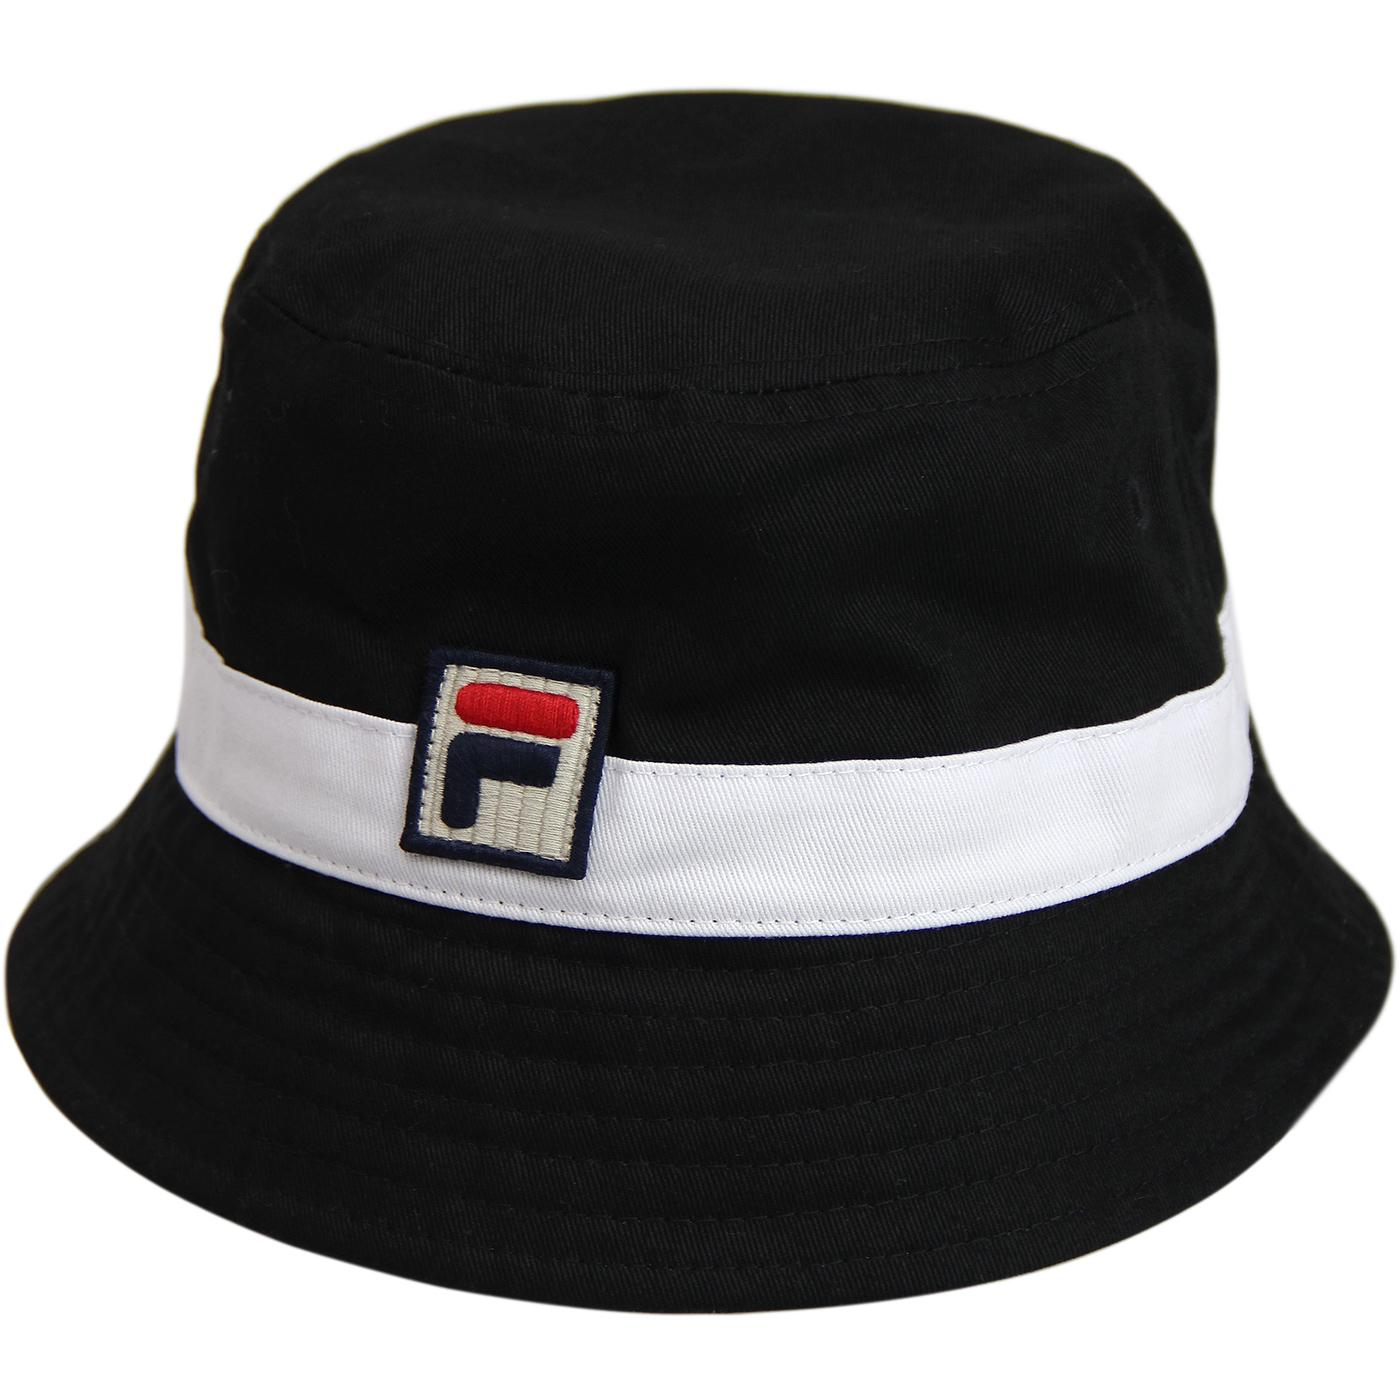 Basil FILA VINTAGE Retro 1990s Bucket Hat (B/W)